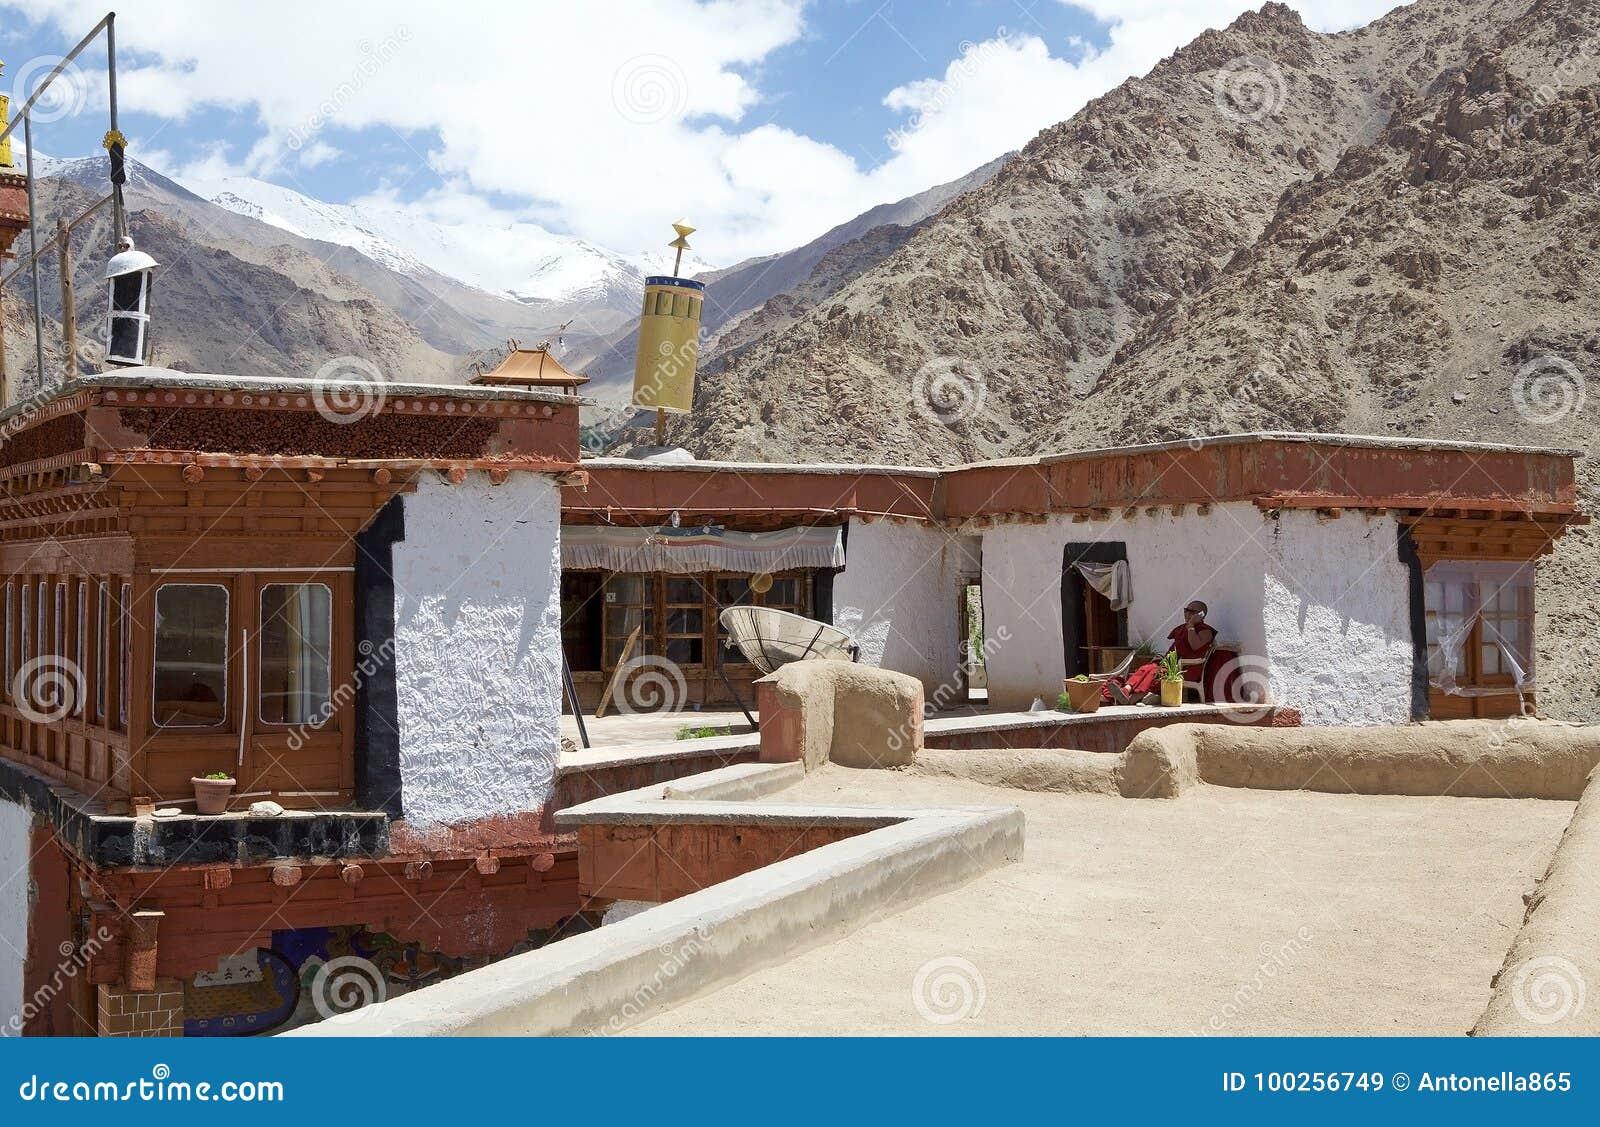 Monaco buddista al monastero di Likir, Ladakh, India